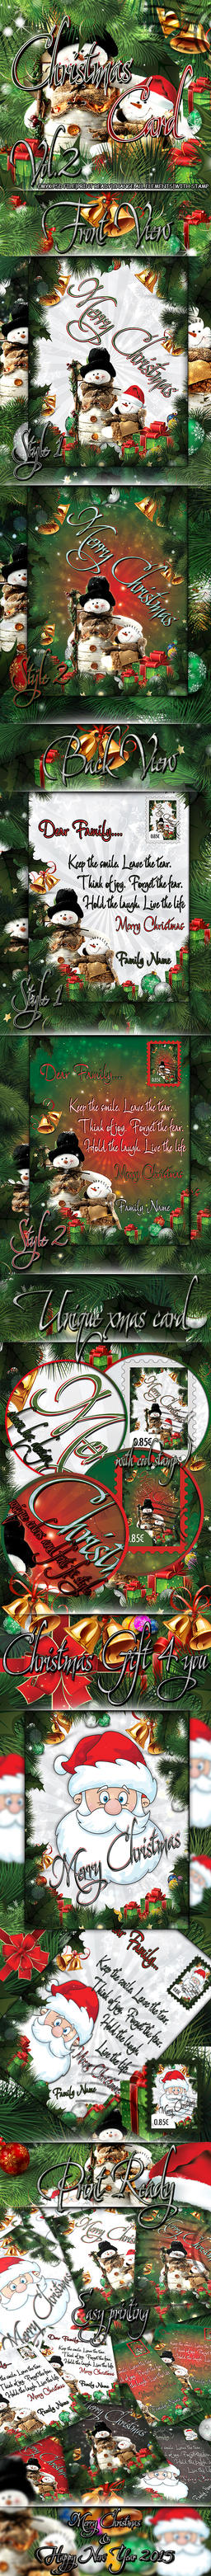 Christmas Card PSD Print Ready by koko26